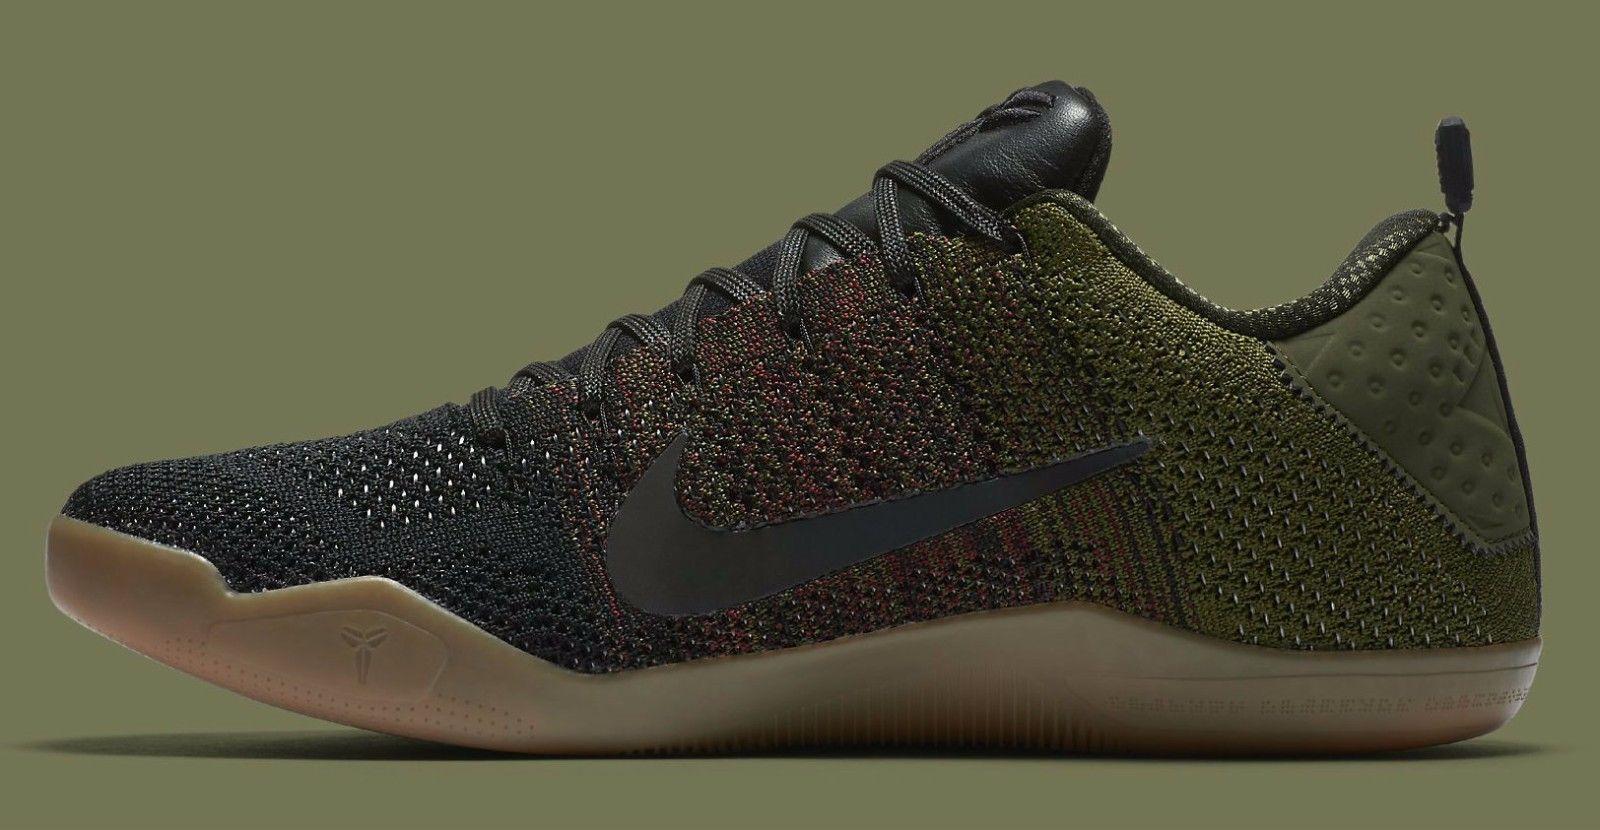 8c2f9fa21fb3 Nike Kobe 11 XI 4KB Black Horse Olive Gum Size Size Size 13.5. 824463-